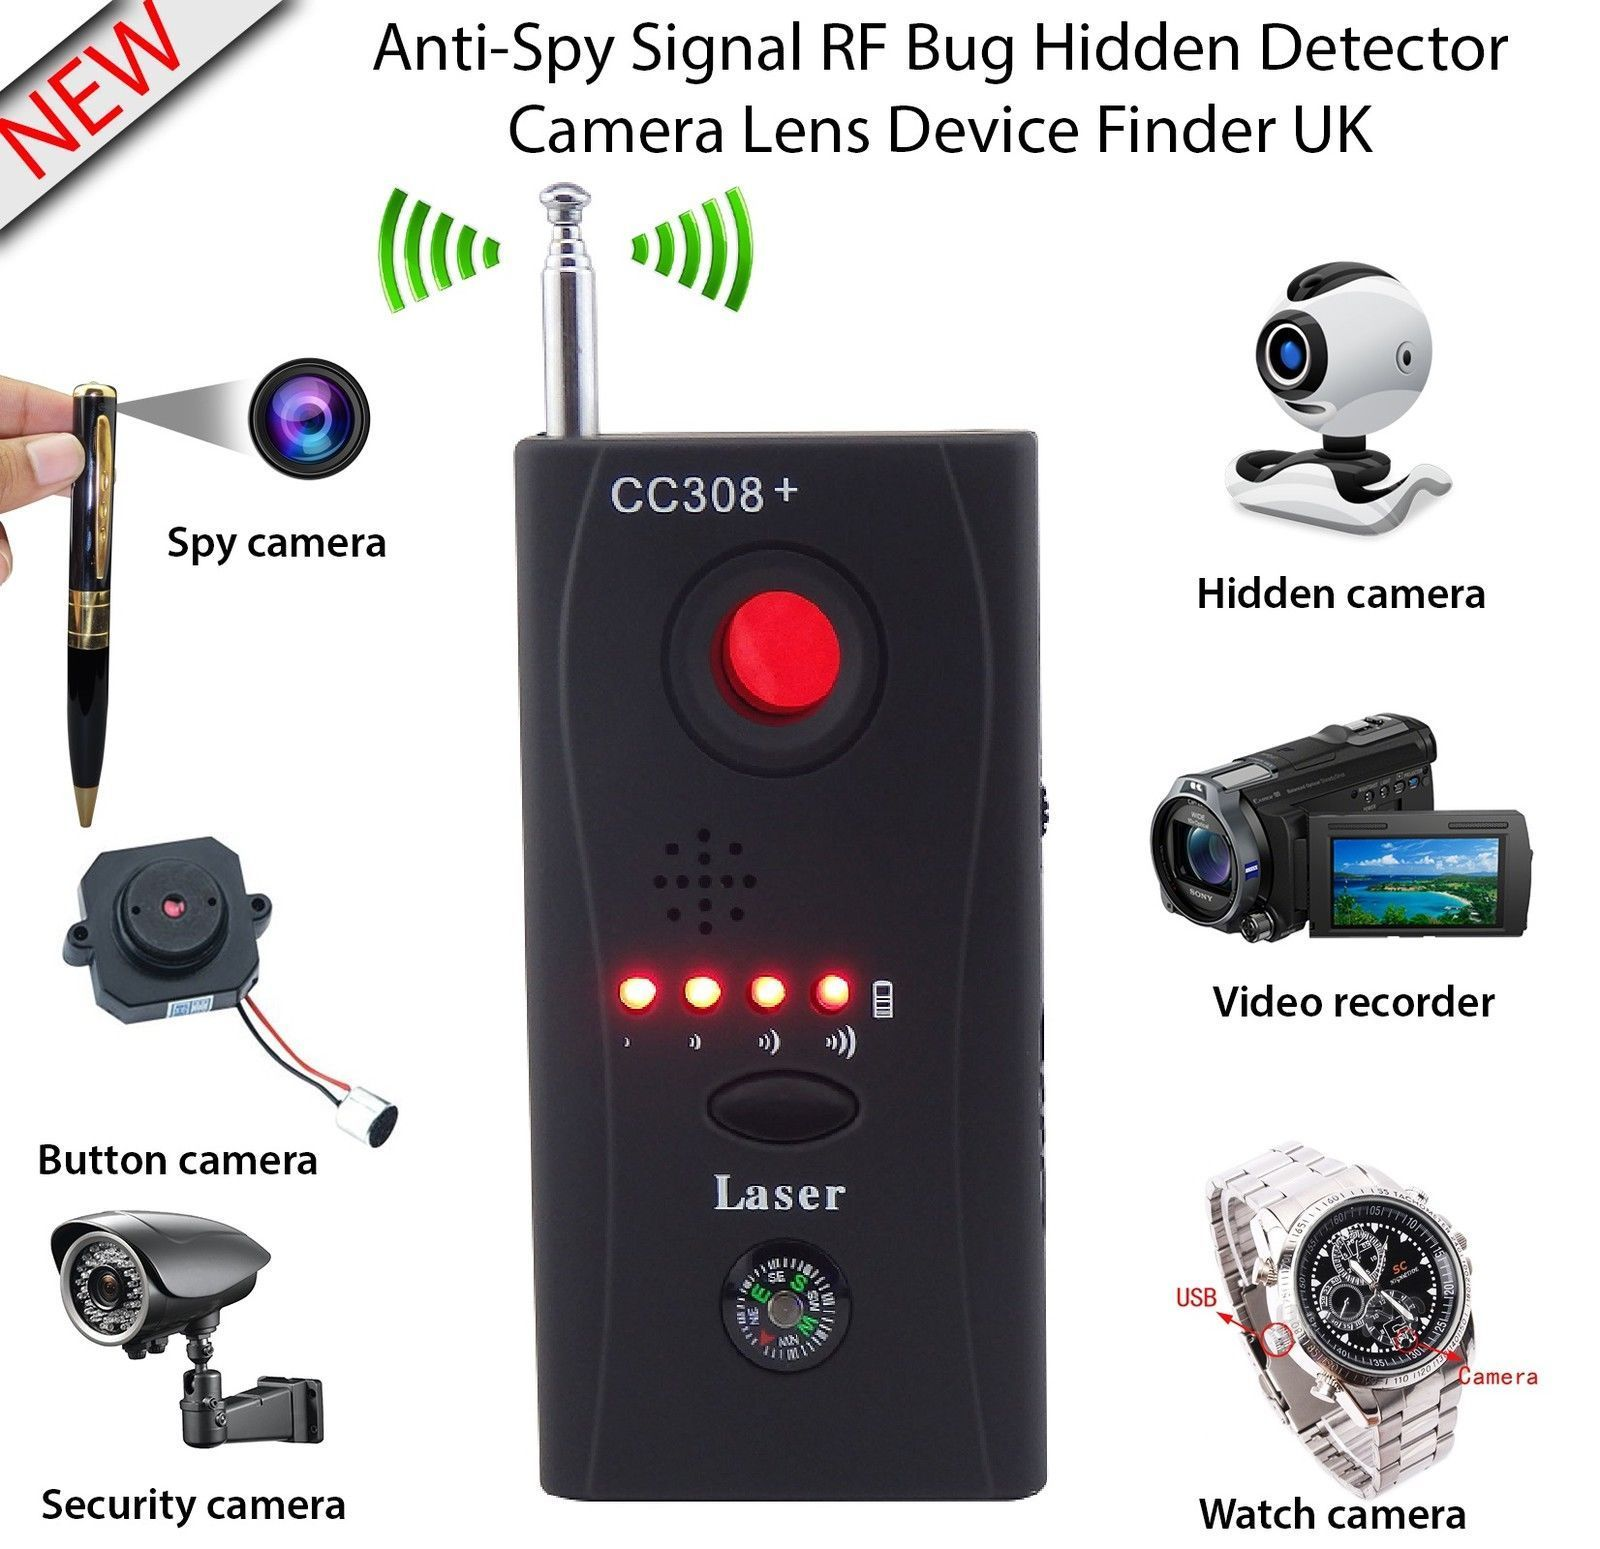 Anti Spy Detector Hidden Camera GSM Audio Bug Finder GPS Signal RF Tracker CAAnti Spy Detector Hidden Camera GSM Audio Bug Finder GPS Signal RF Tracker CA